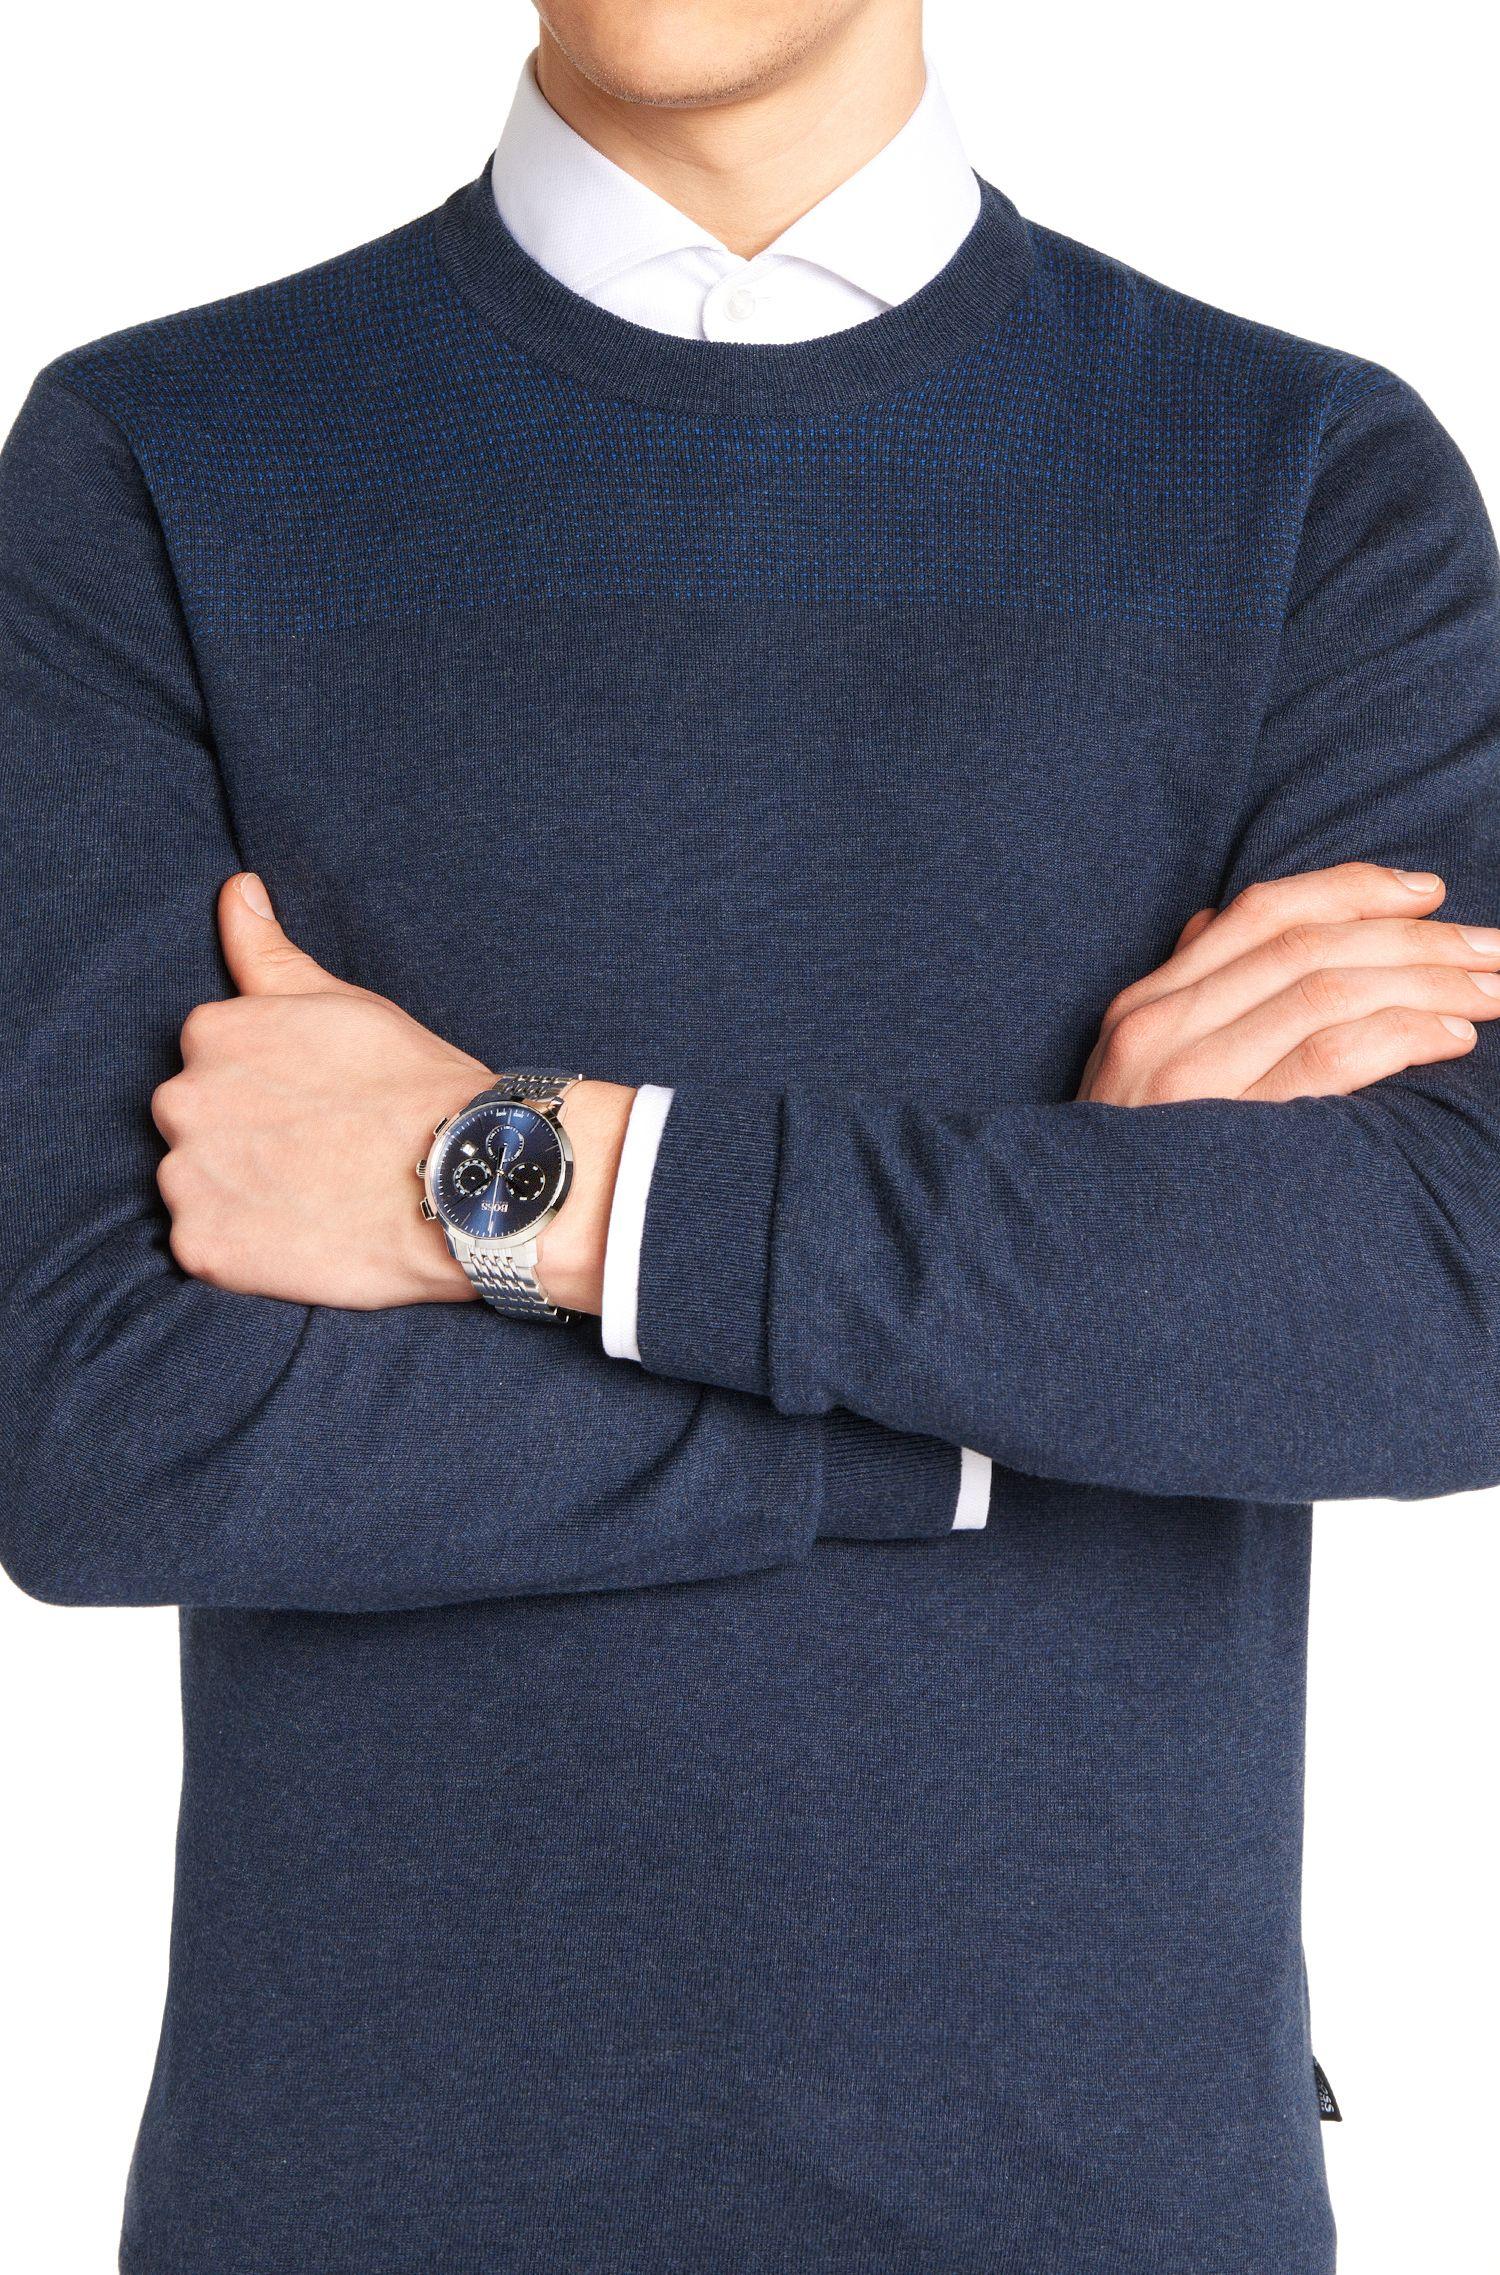 '1513269' | Chronograph Stainless Steel Swiss Quartz Watch